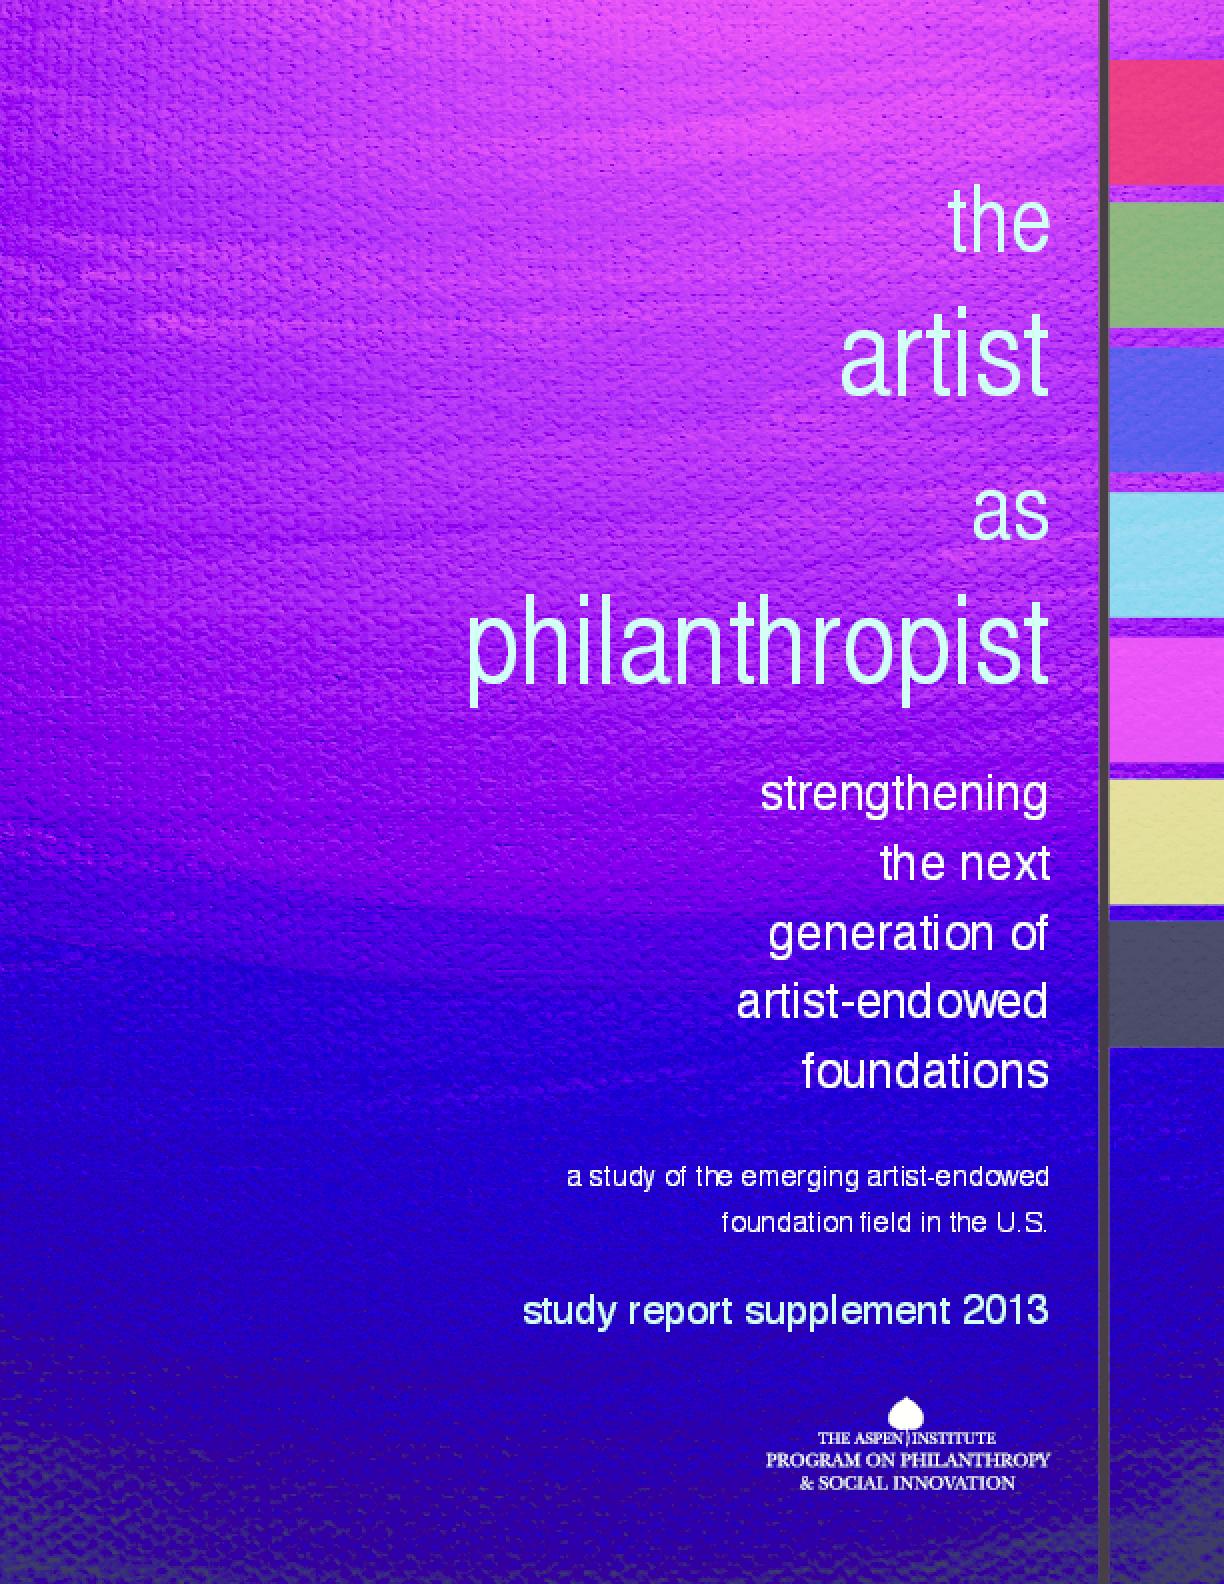 The Artist as Philanthropist: Strengthening the Next Generation of Artist-Endowed Foundations, Study Report Supplement 2013